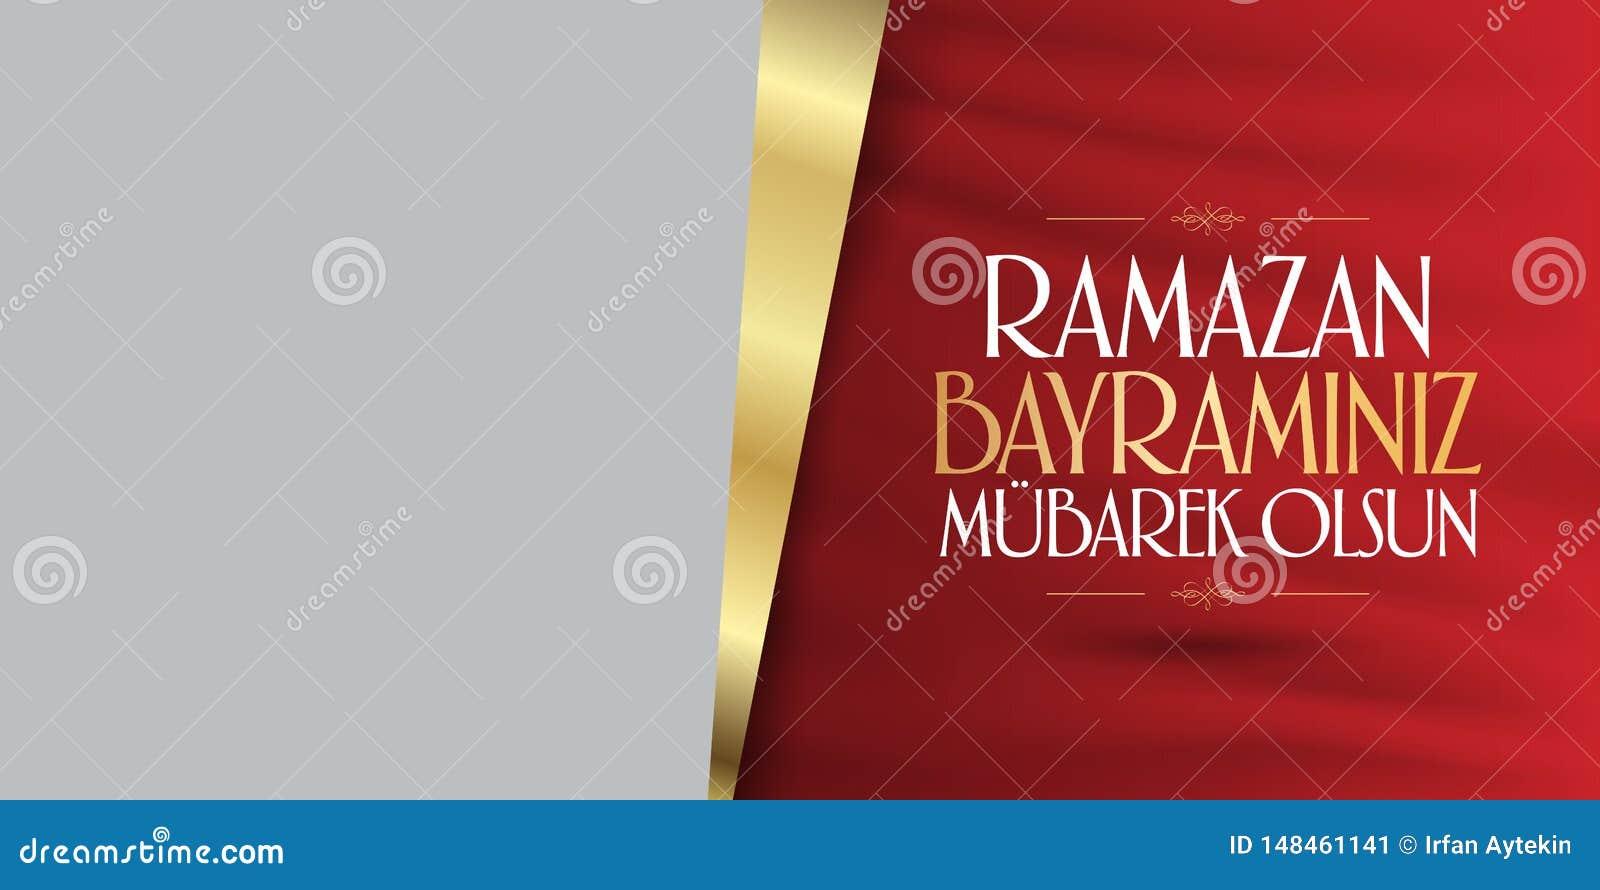 Cumprimentos de Eid al-Fitr Mubarak Islamic Feast turcos: Mês de Ramazan Bayraminiz Mubarek Olsun Holy da comunidade muçulmana Ra